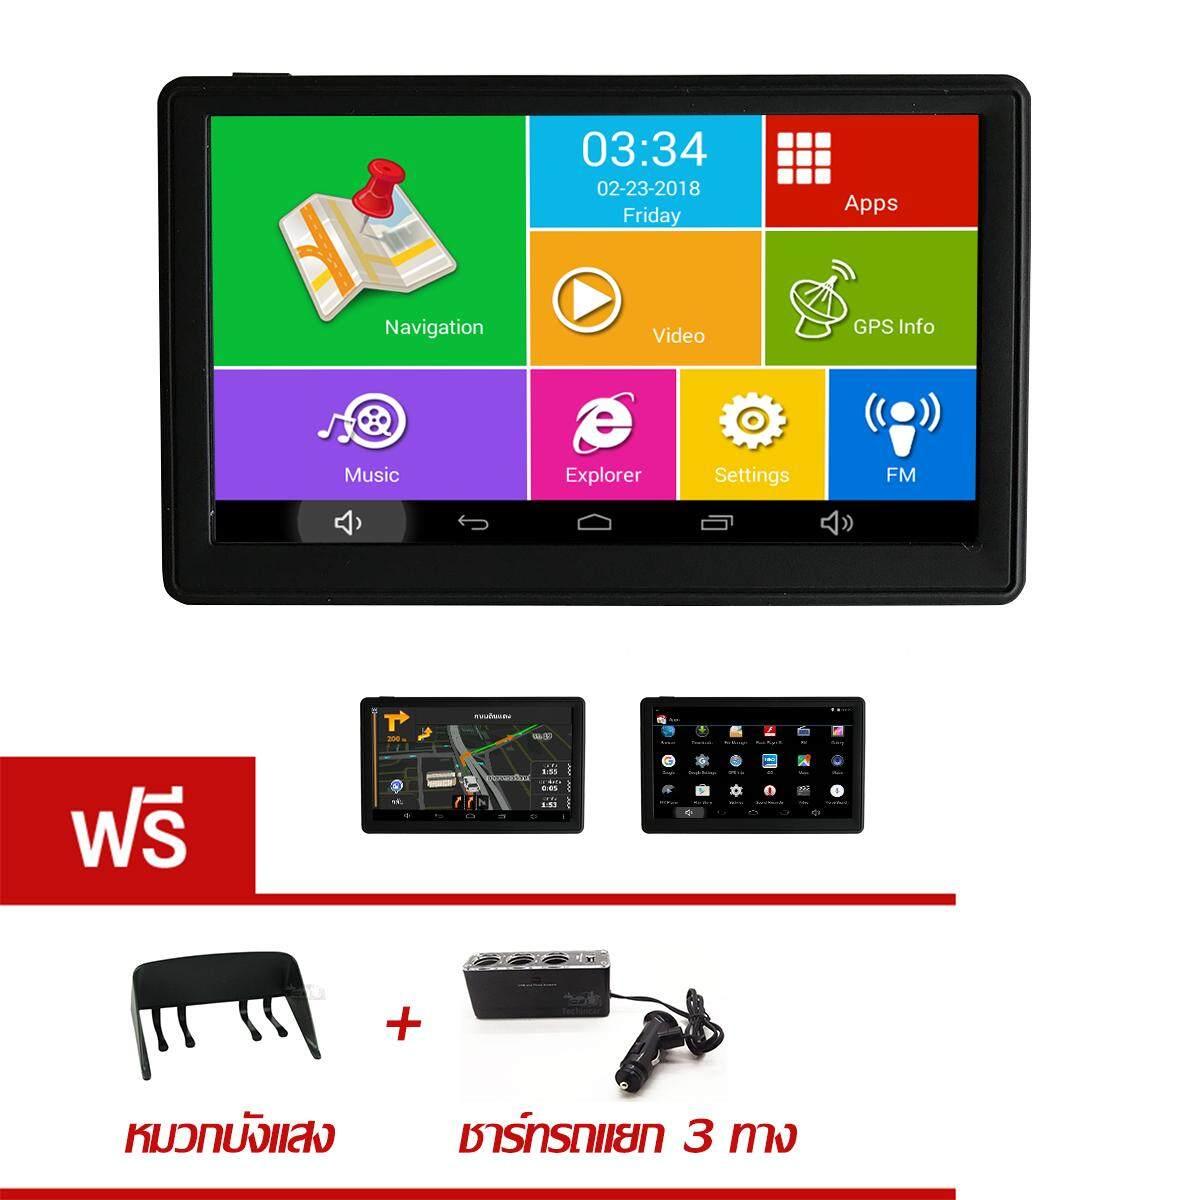 GPSนำทาง3D ติดรถยนต์ Android Wifi ขนาดหน้าจอ 7.0\ รุ่น M515 7.0\8GB AV-IN Bluetooth